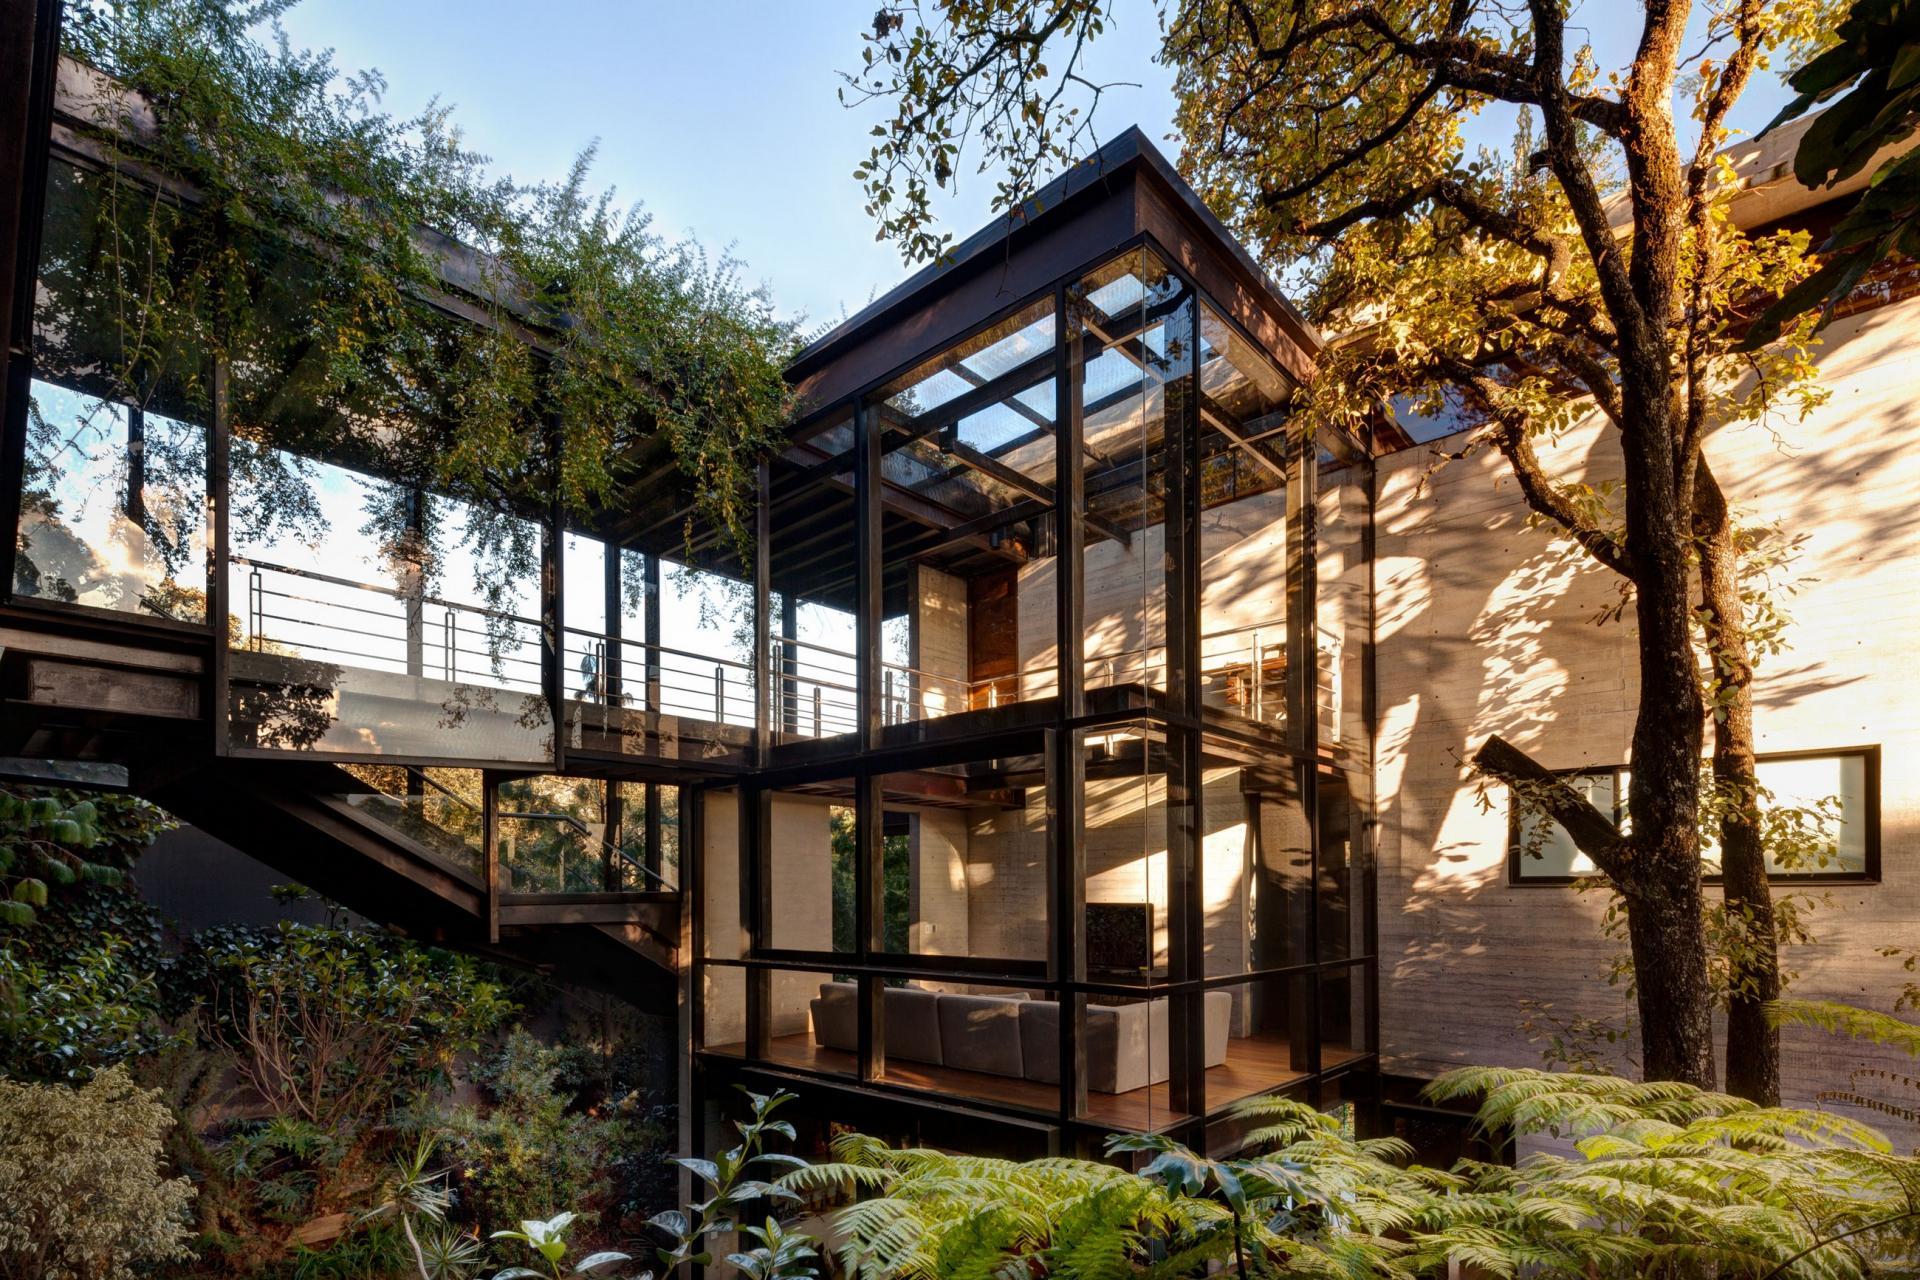 Stunning La Casa En El Bosque Tree House Proves That